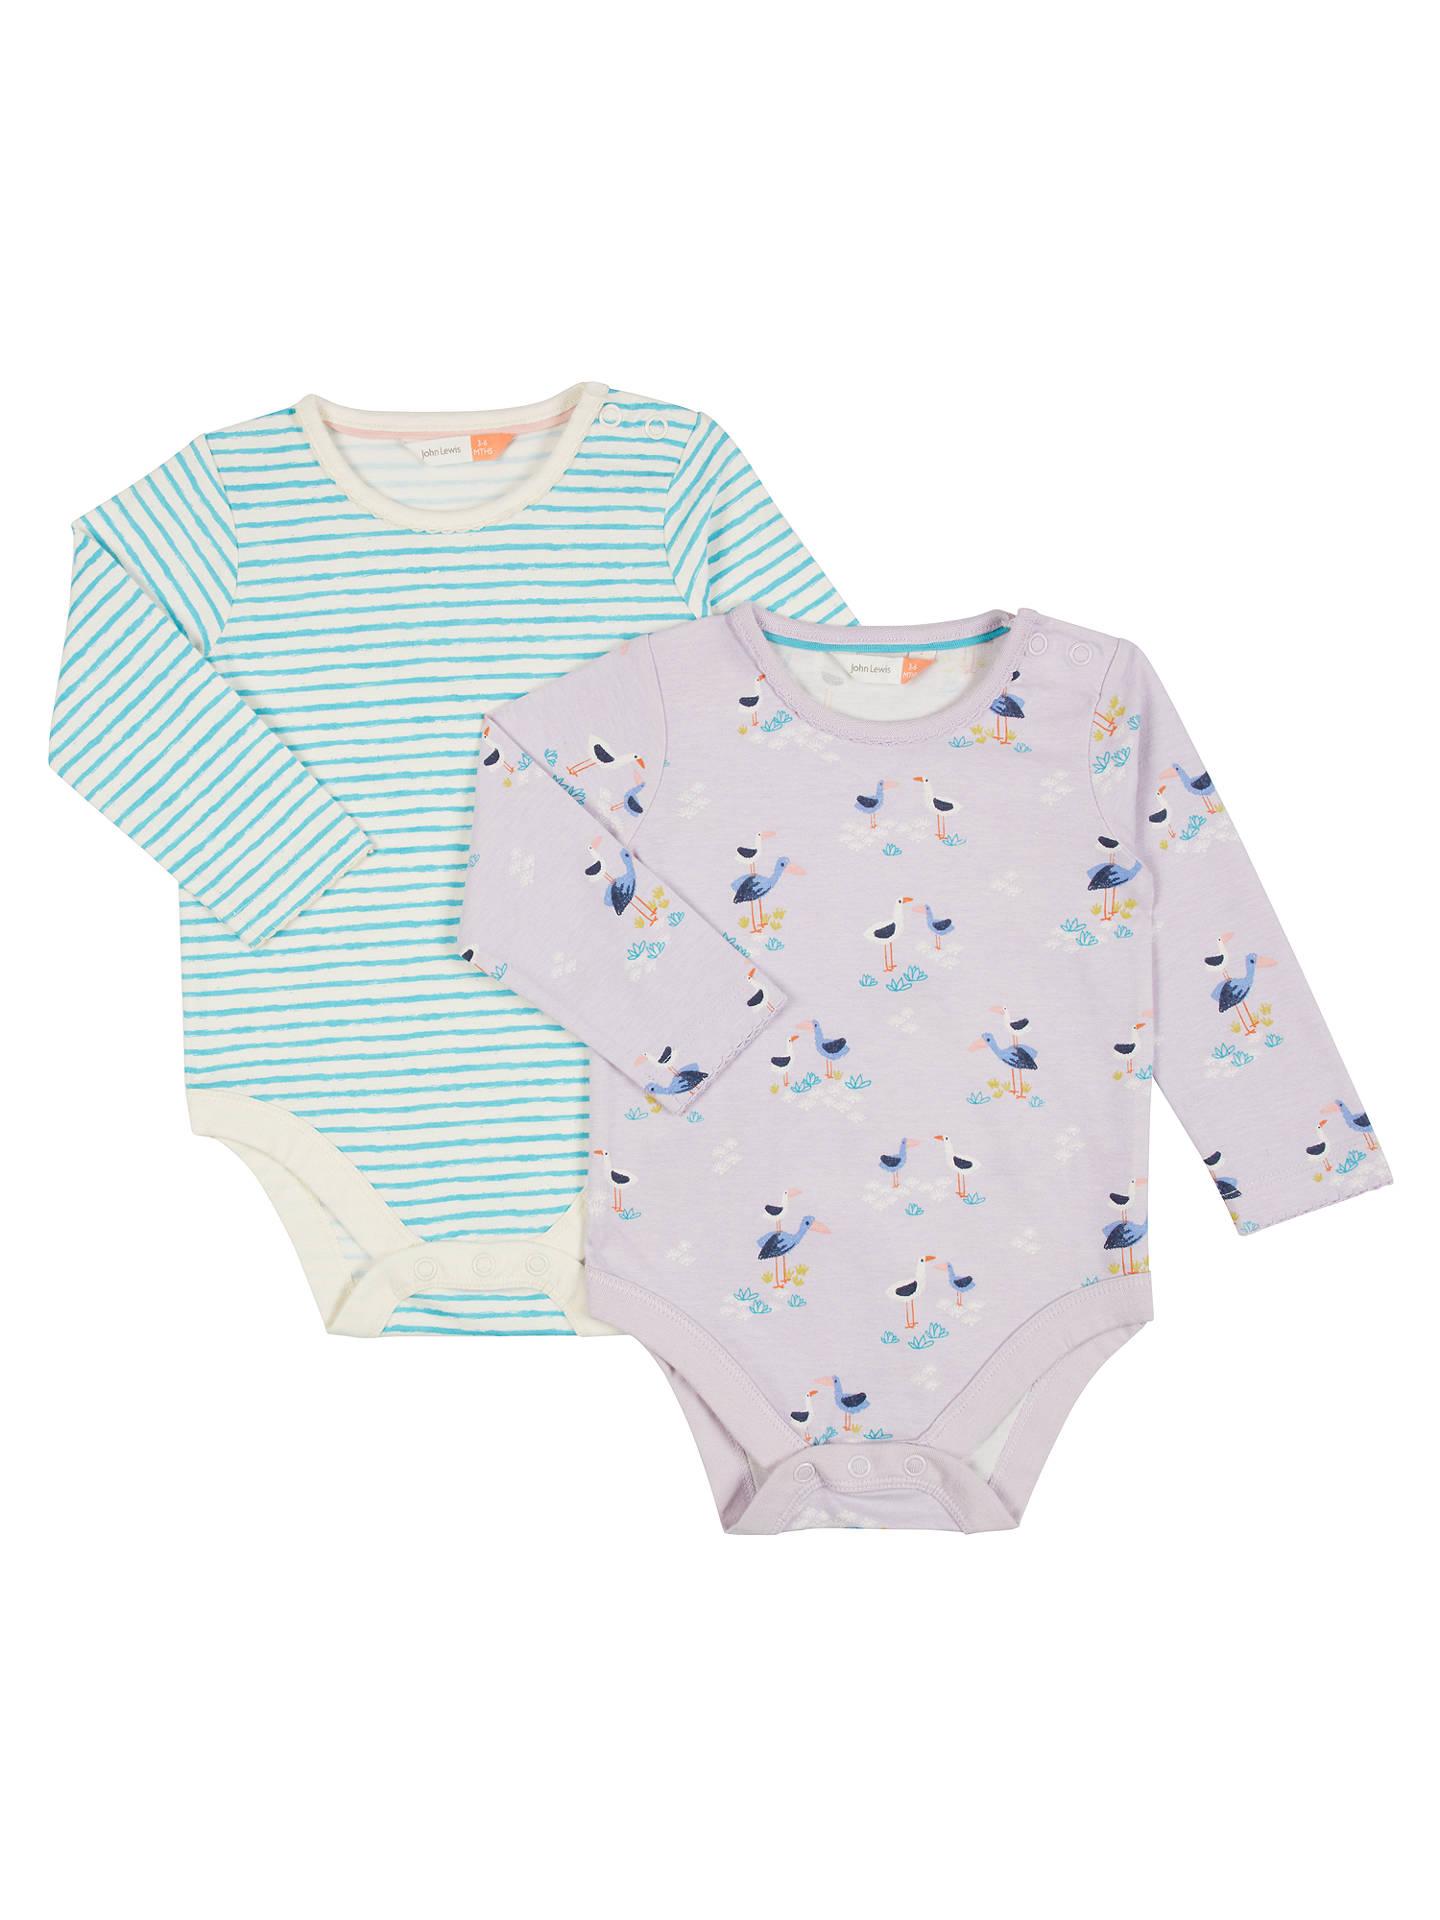 John Lewis Baby Stork Long Sleeve Bodysuits Pack Of 2